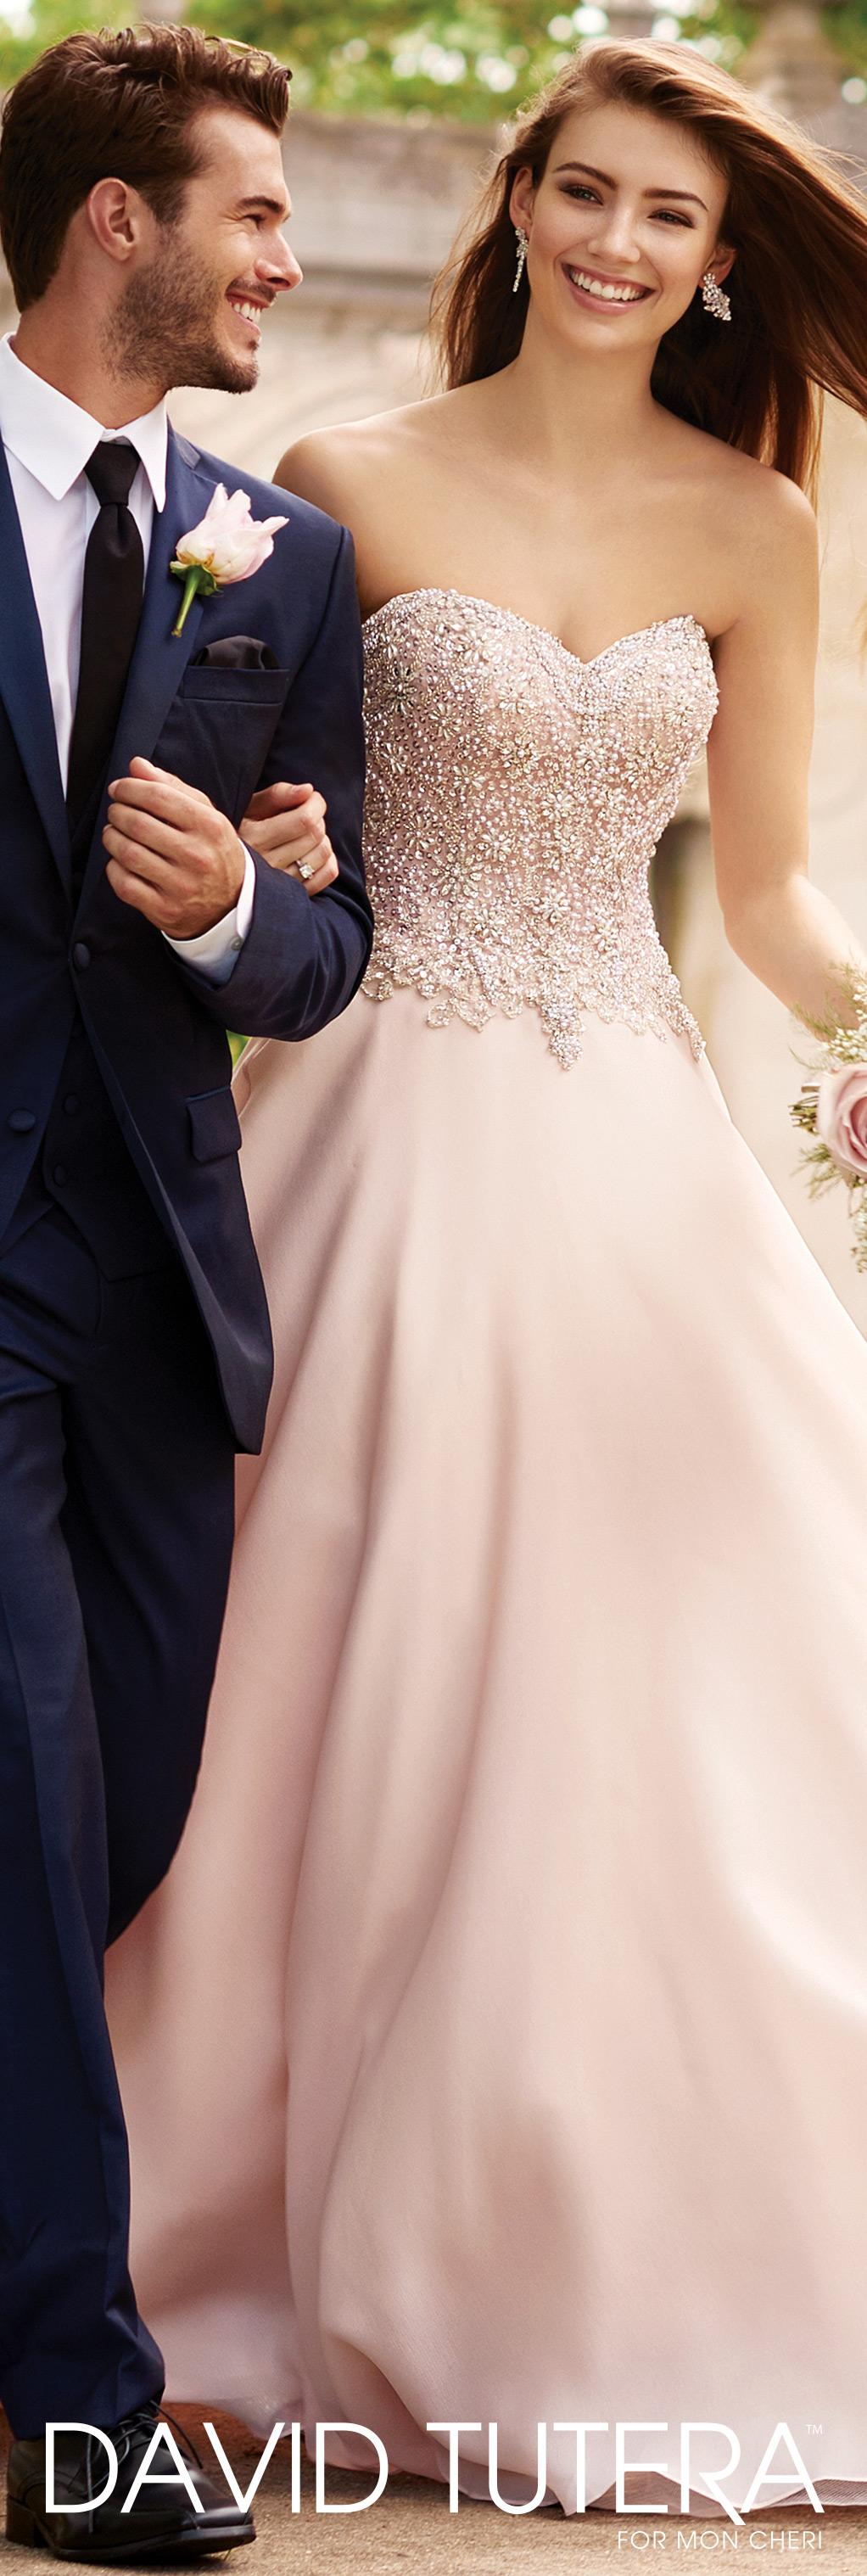 Strapless Satin Beaded Ball Gown Wedding Dress- 117266 Adelina ...